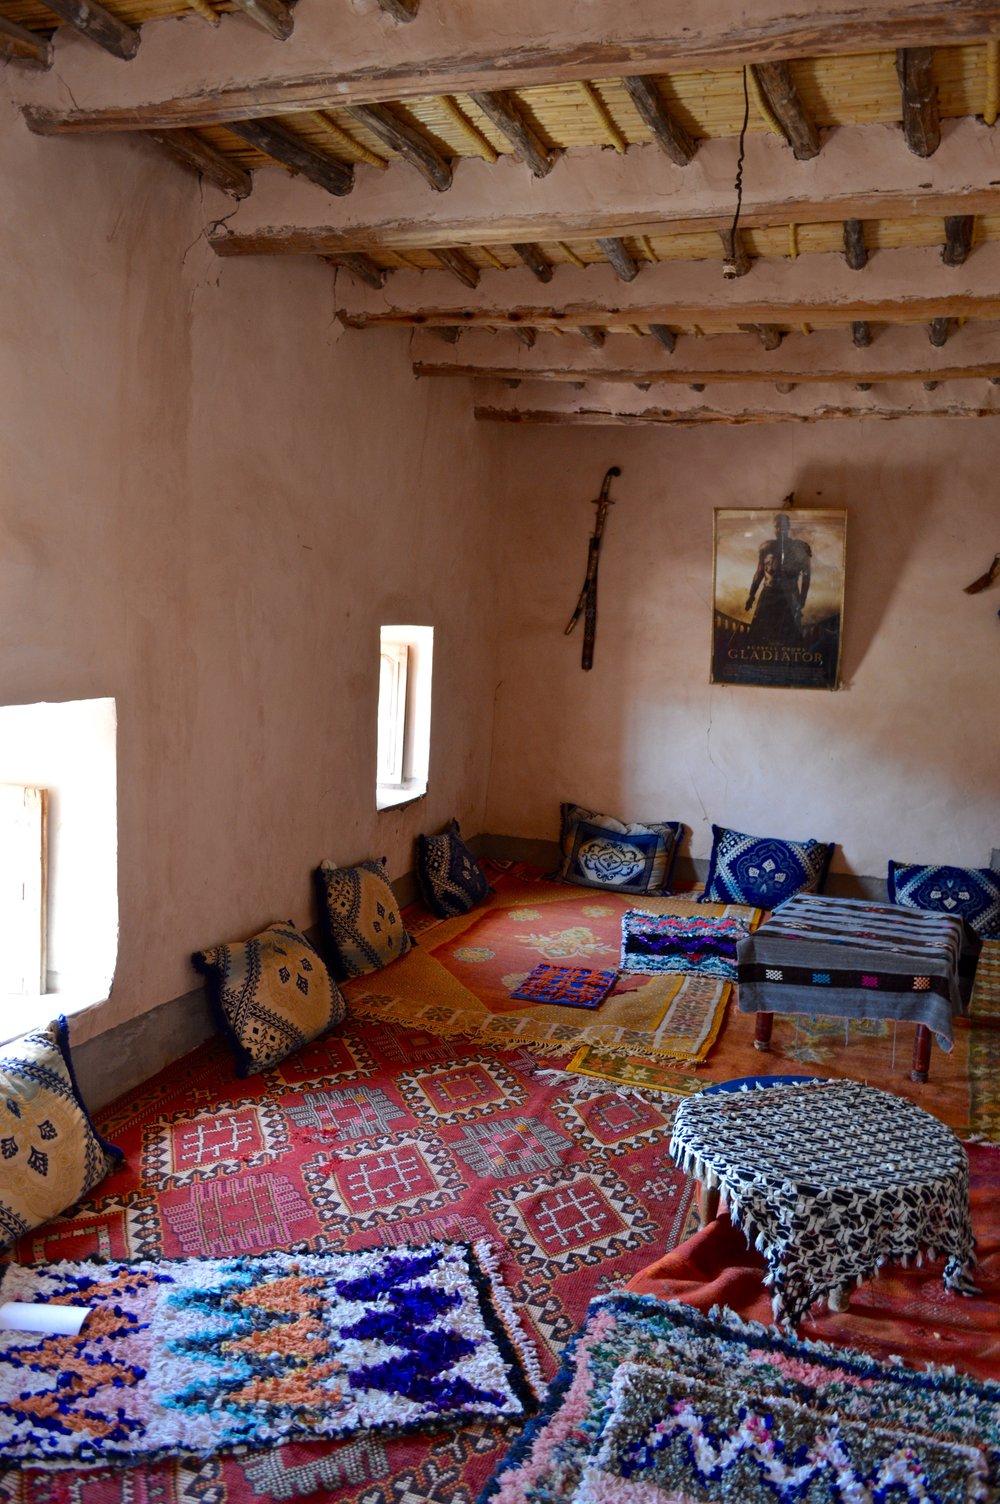 Berber Home in Ait Ben Haddou